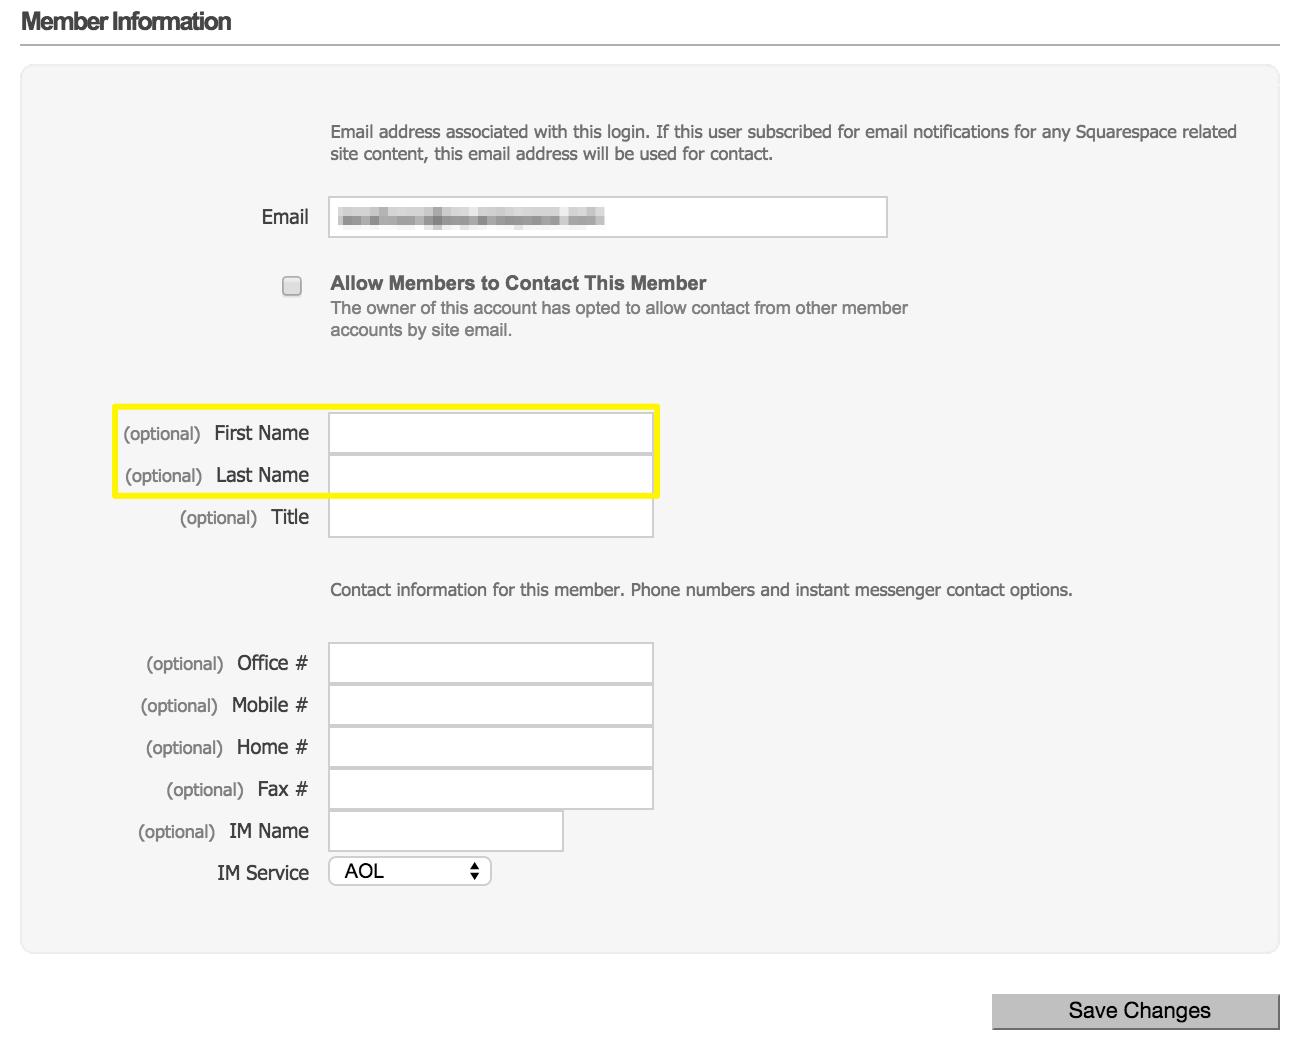 Squarespace 5 Help  Registering a domain through Squarespace